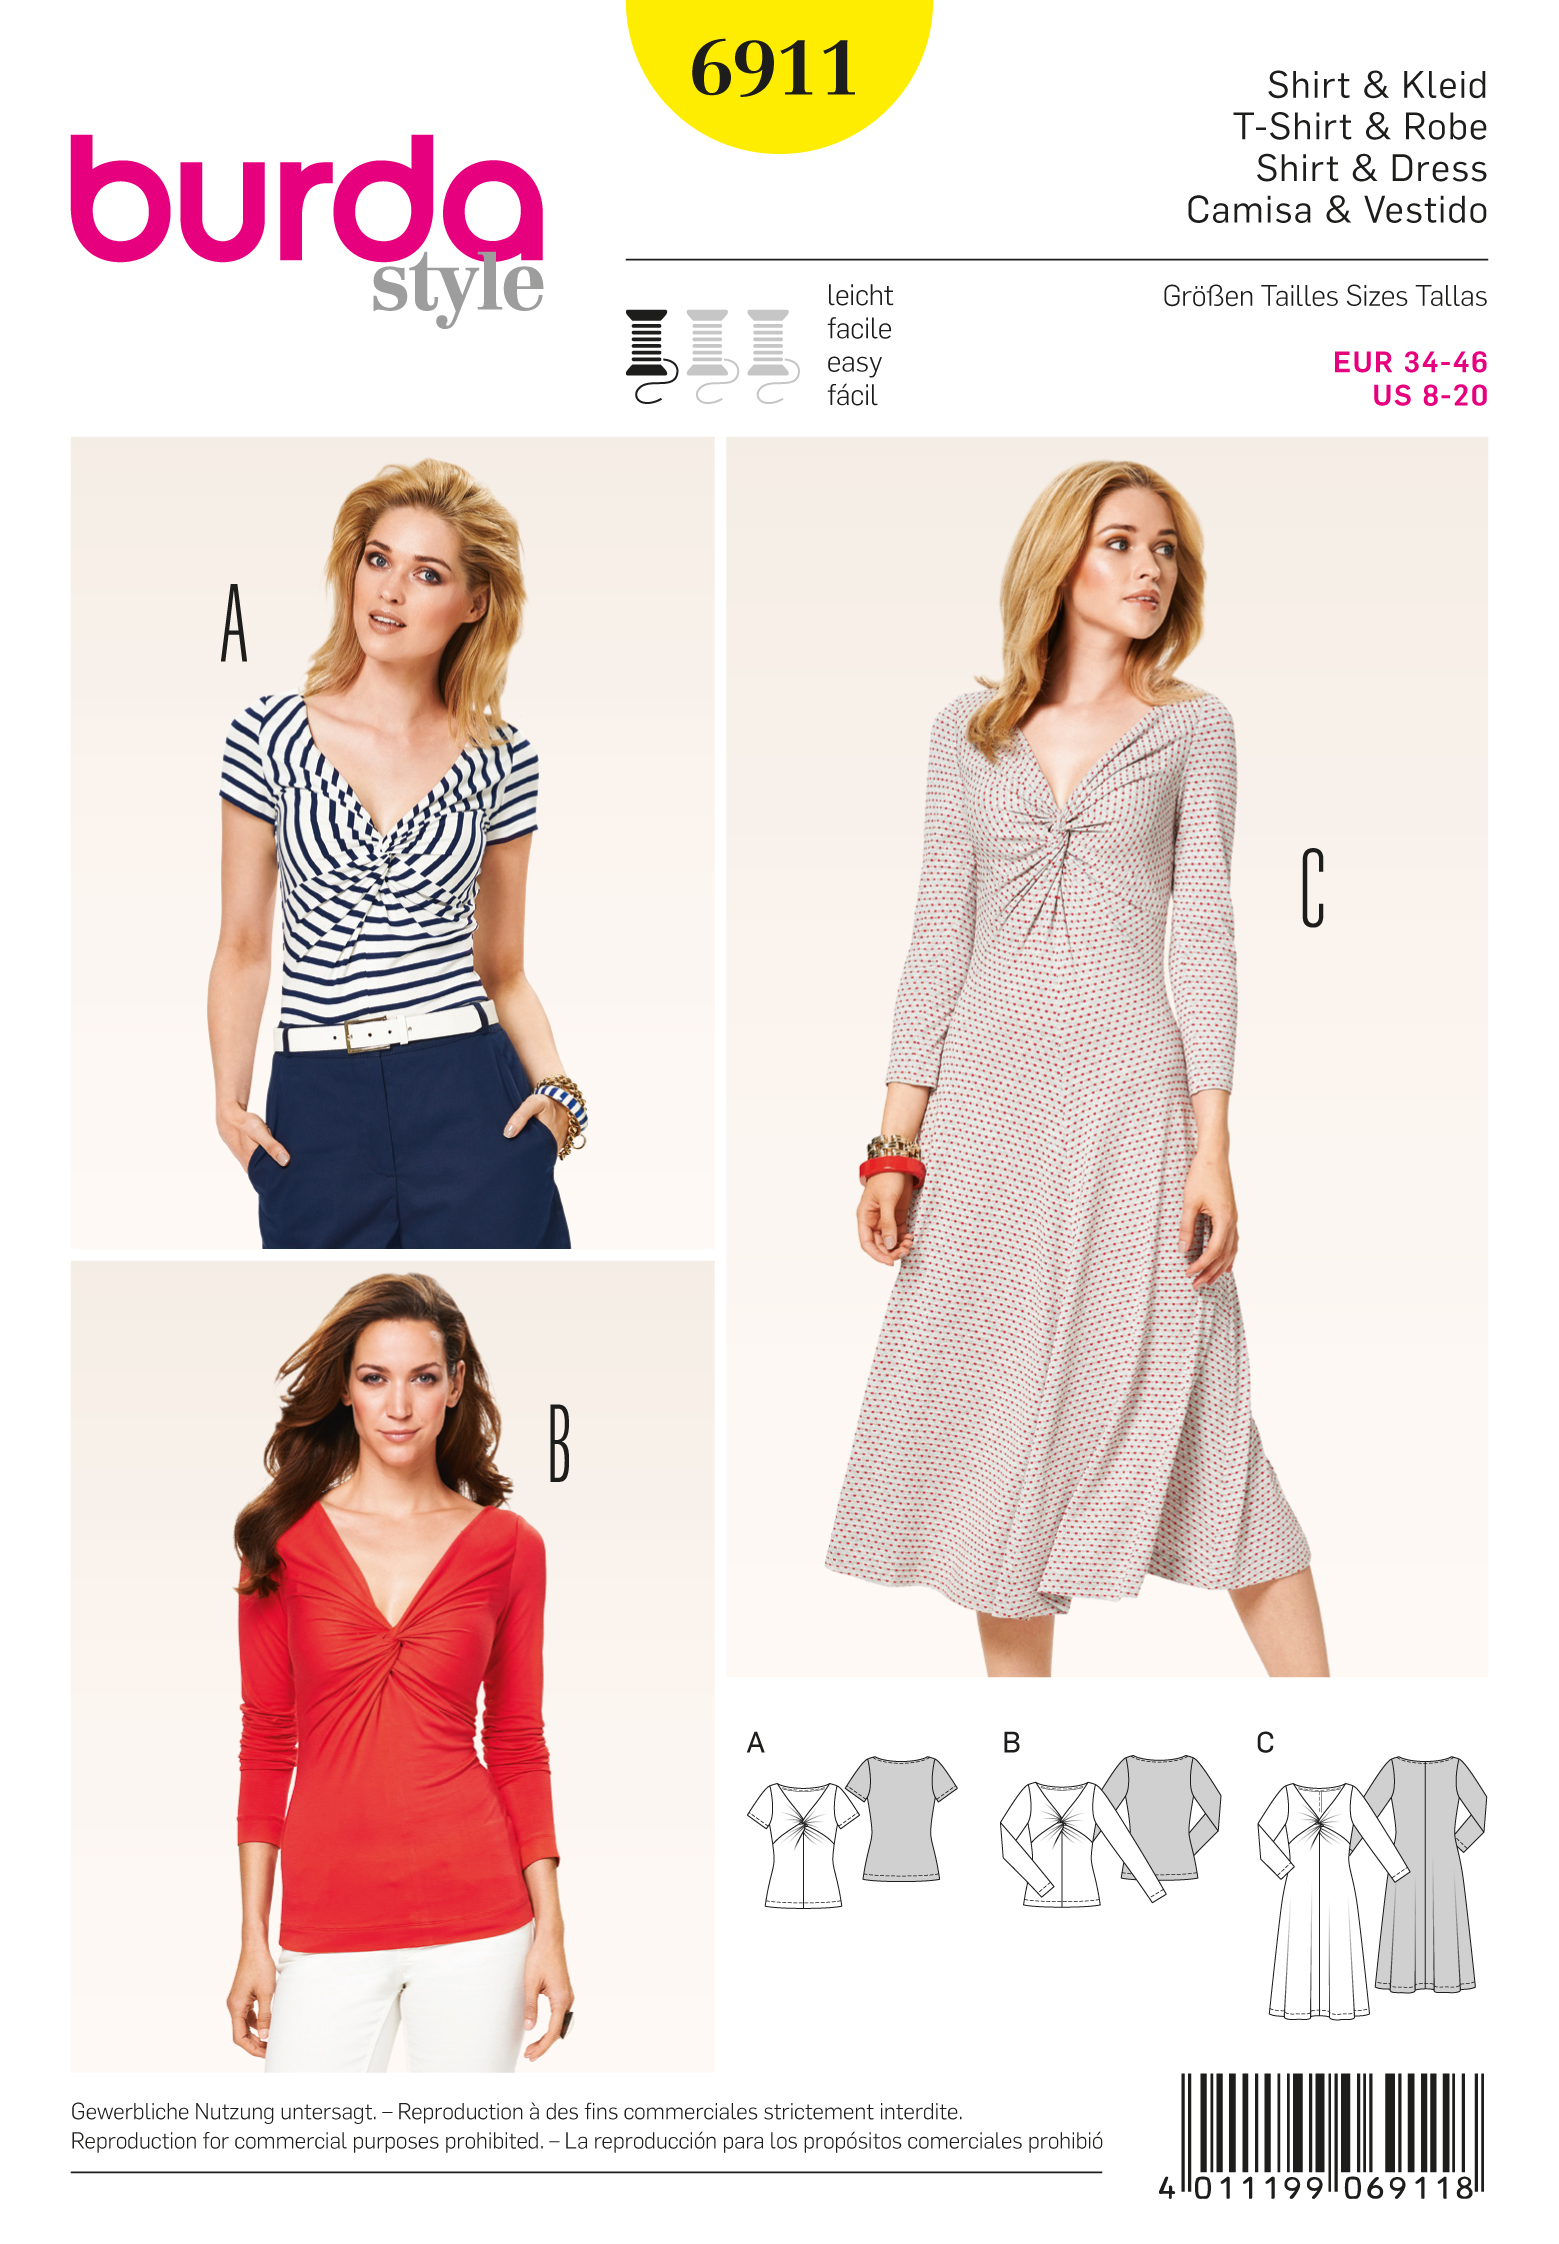 Burda Dresses 6911